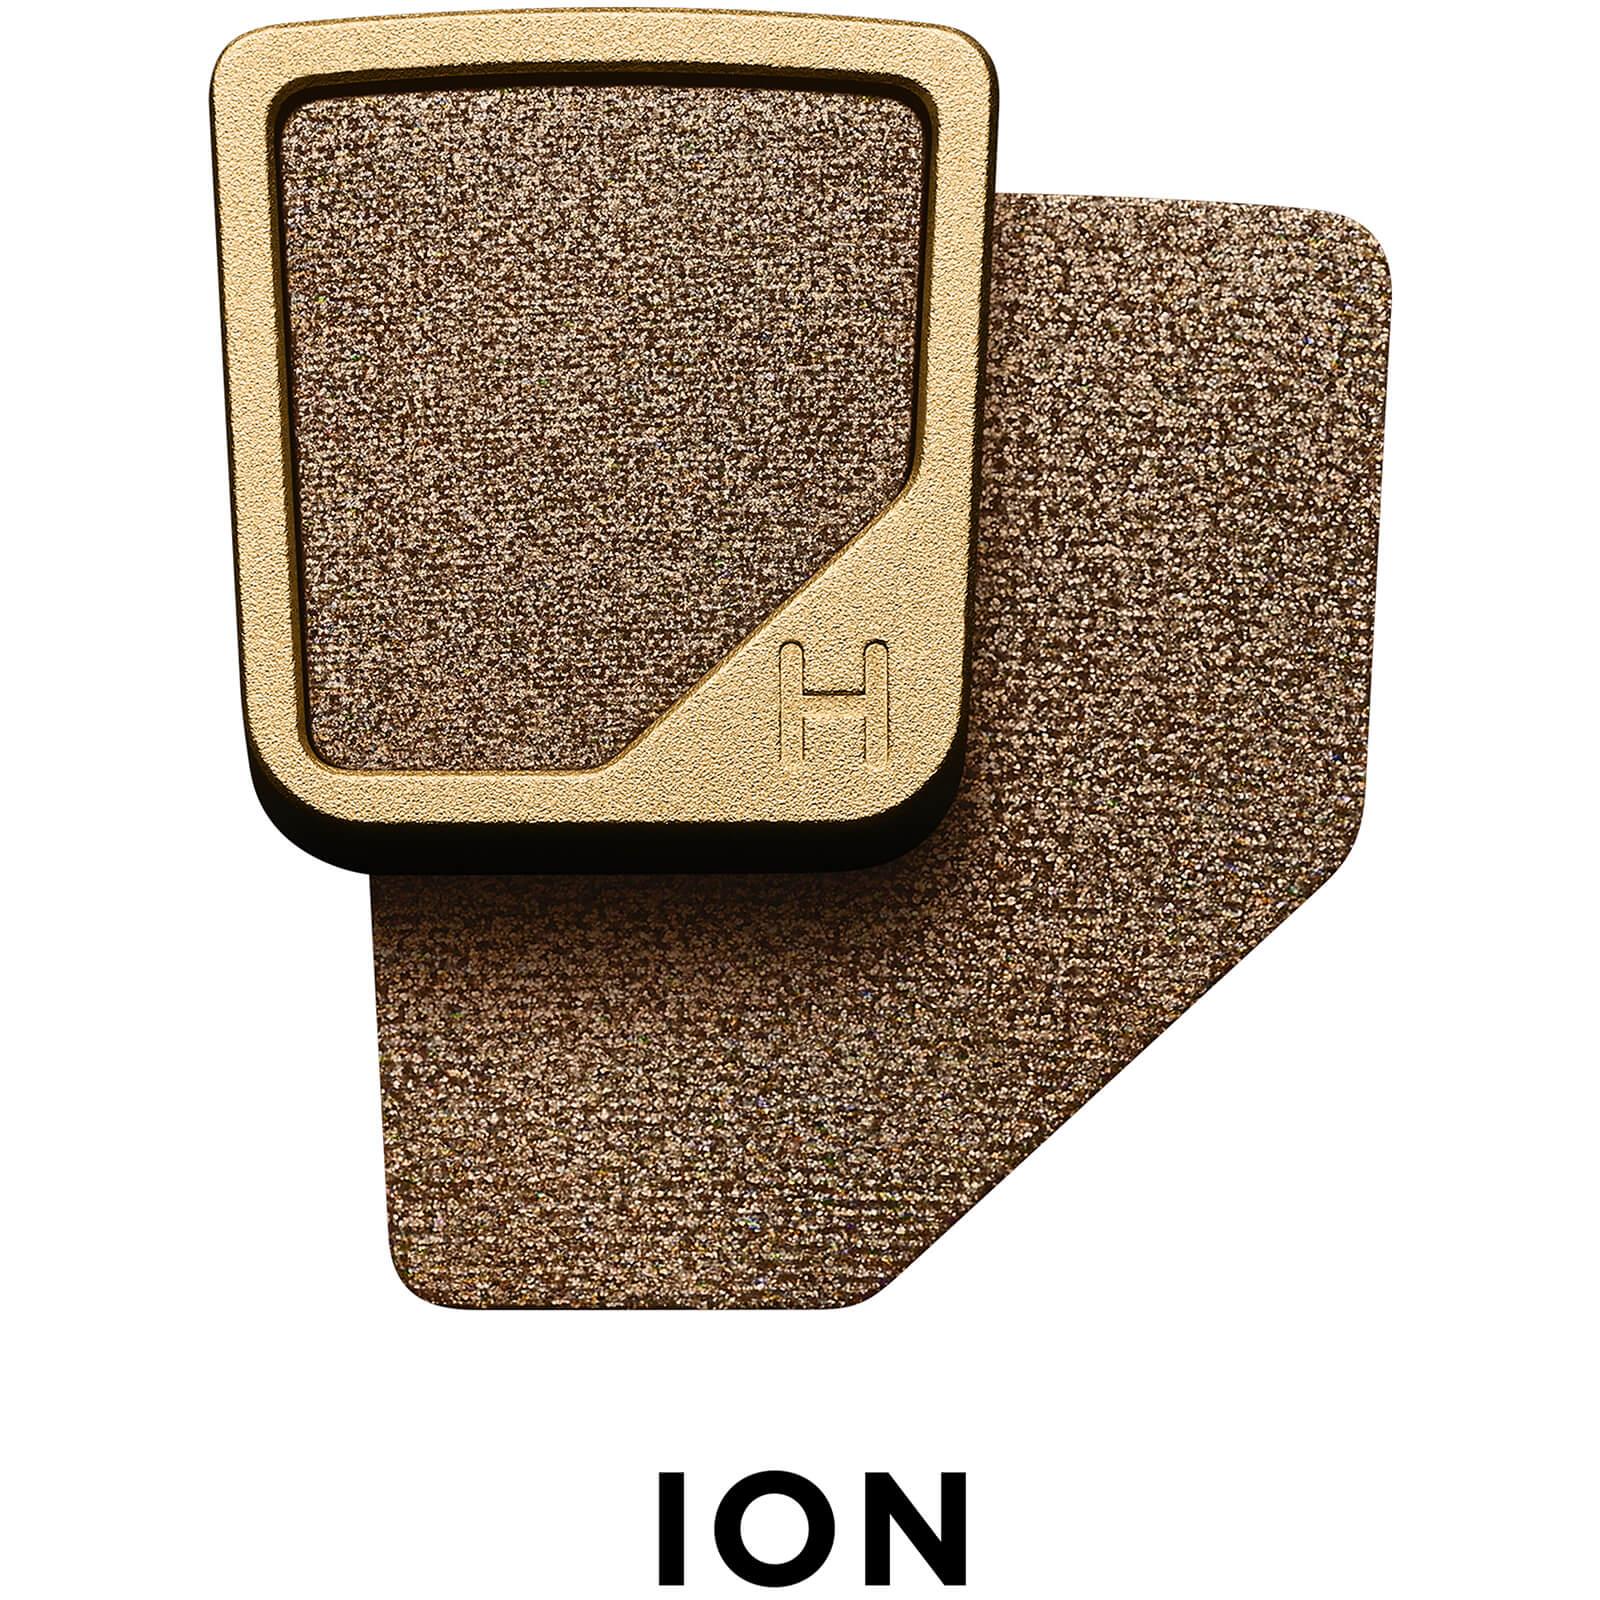 Hourglass Curator Eyeshadow (Various Shades) - Ion